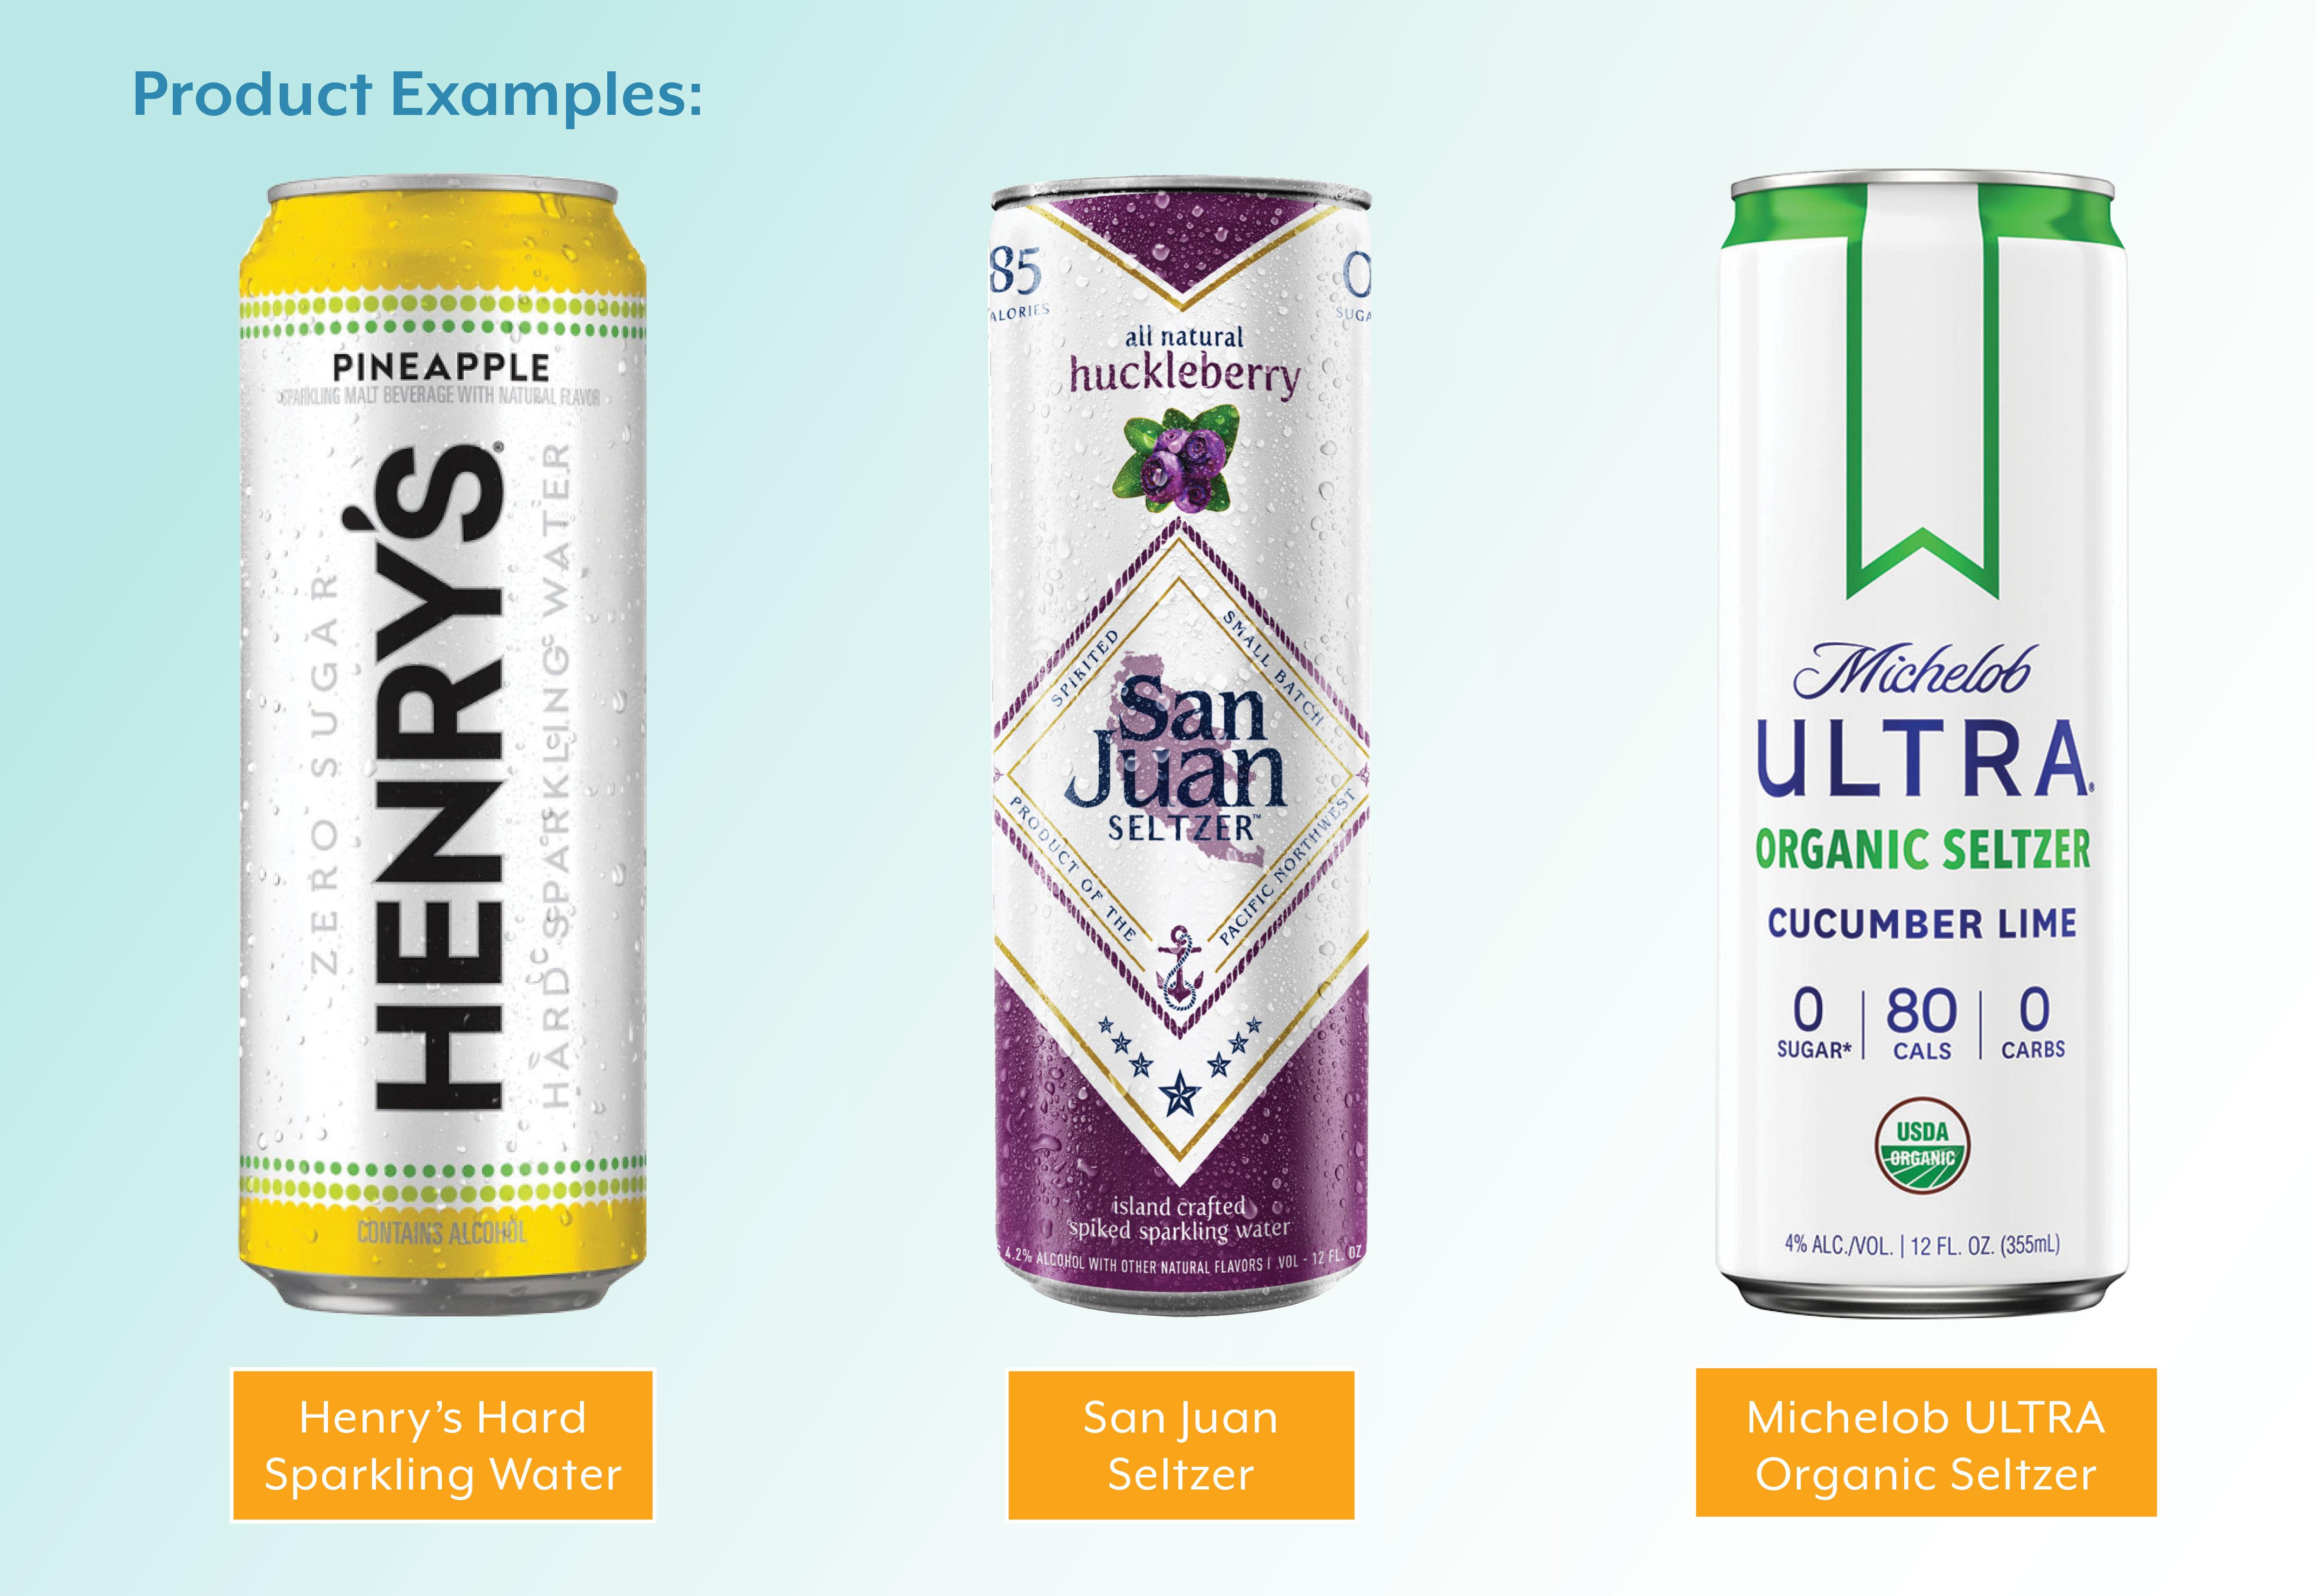 hard-seltzer-products-wellness